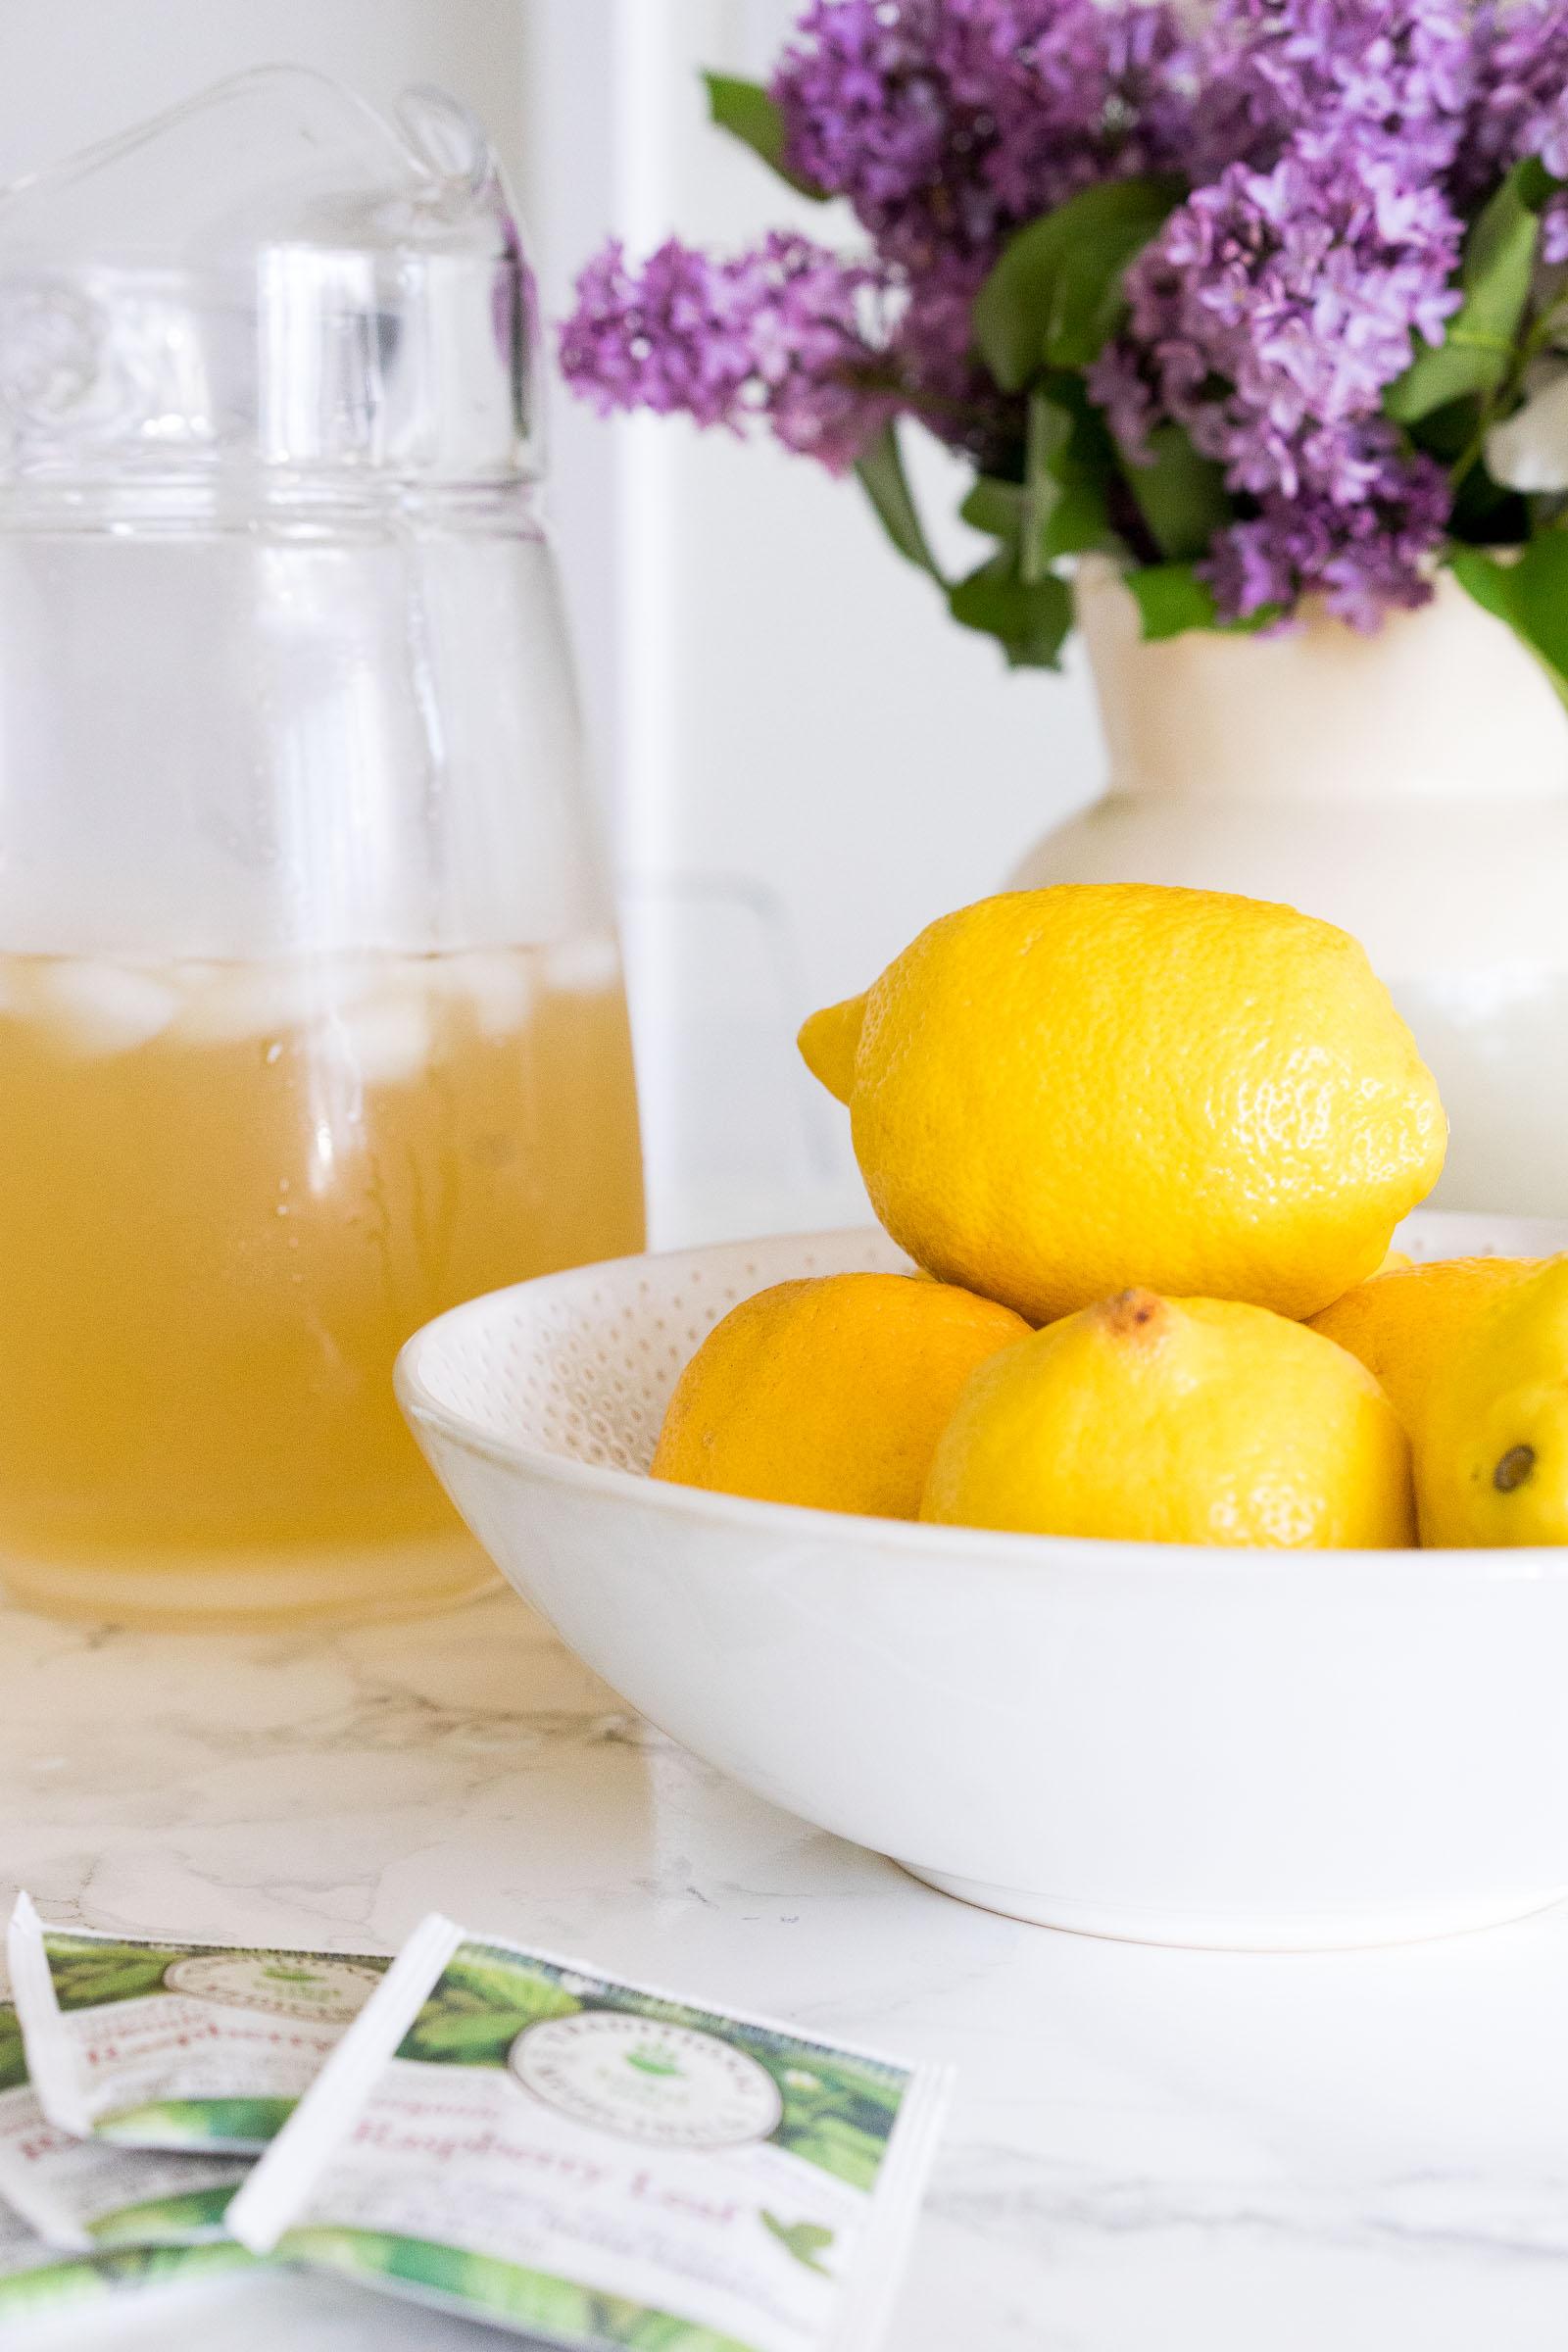 3rd-trimester-arnold-palmer-raspberry-leaf-tea-lemonade-recipe-12.jpg